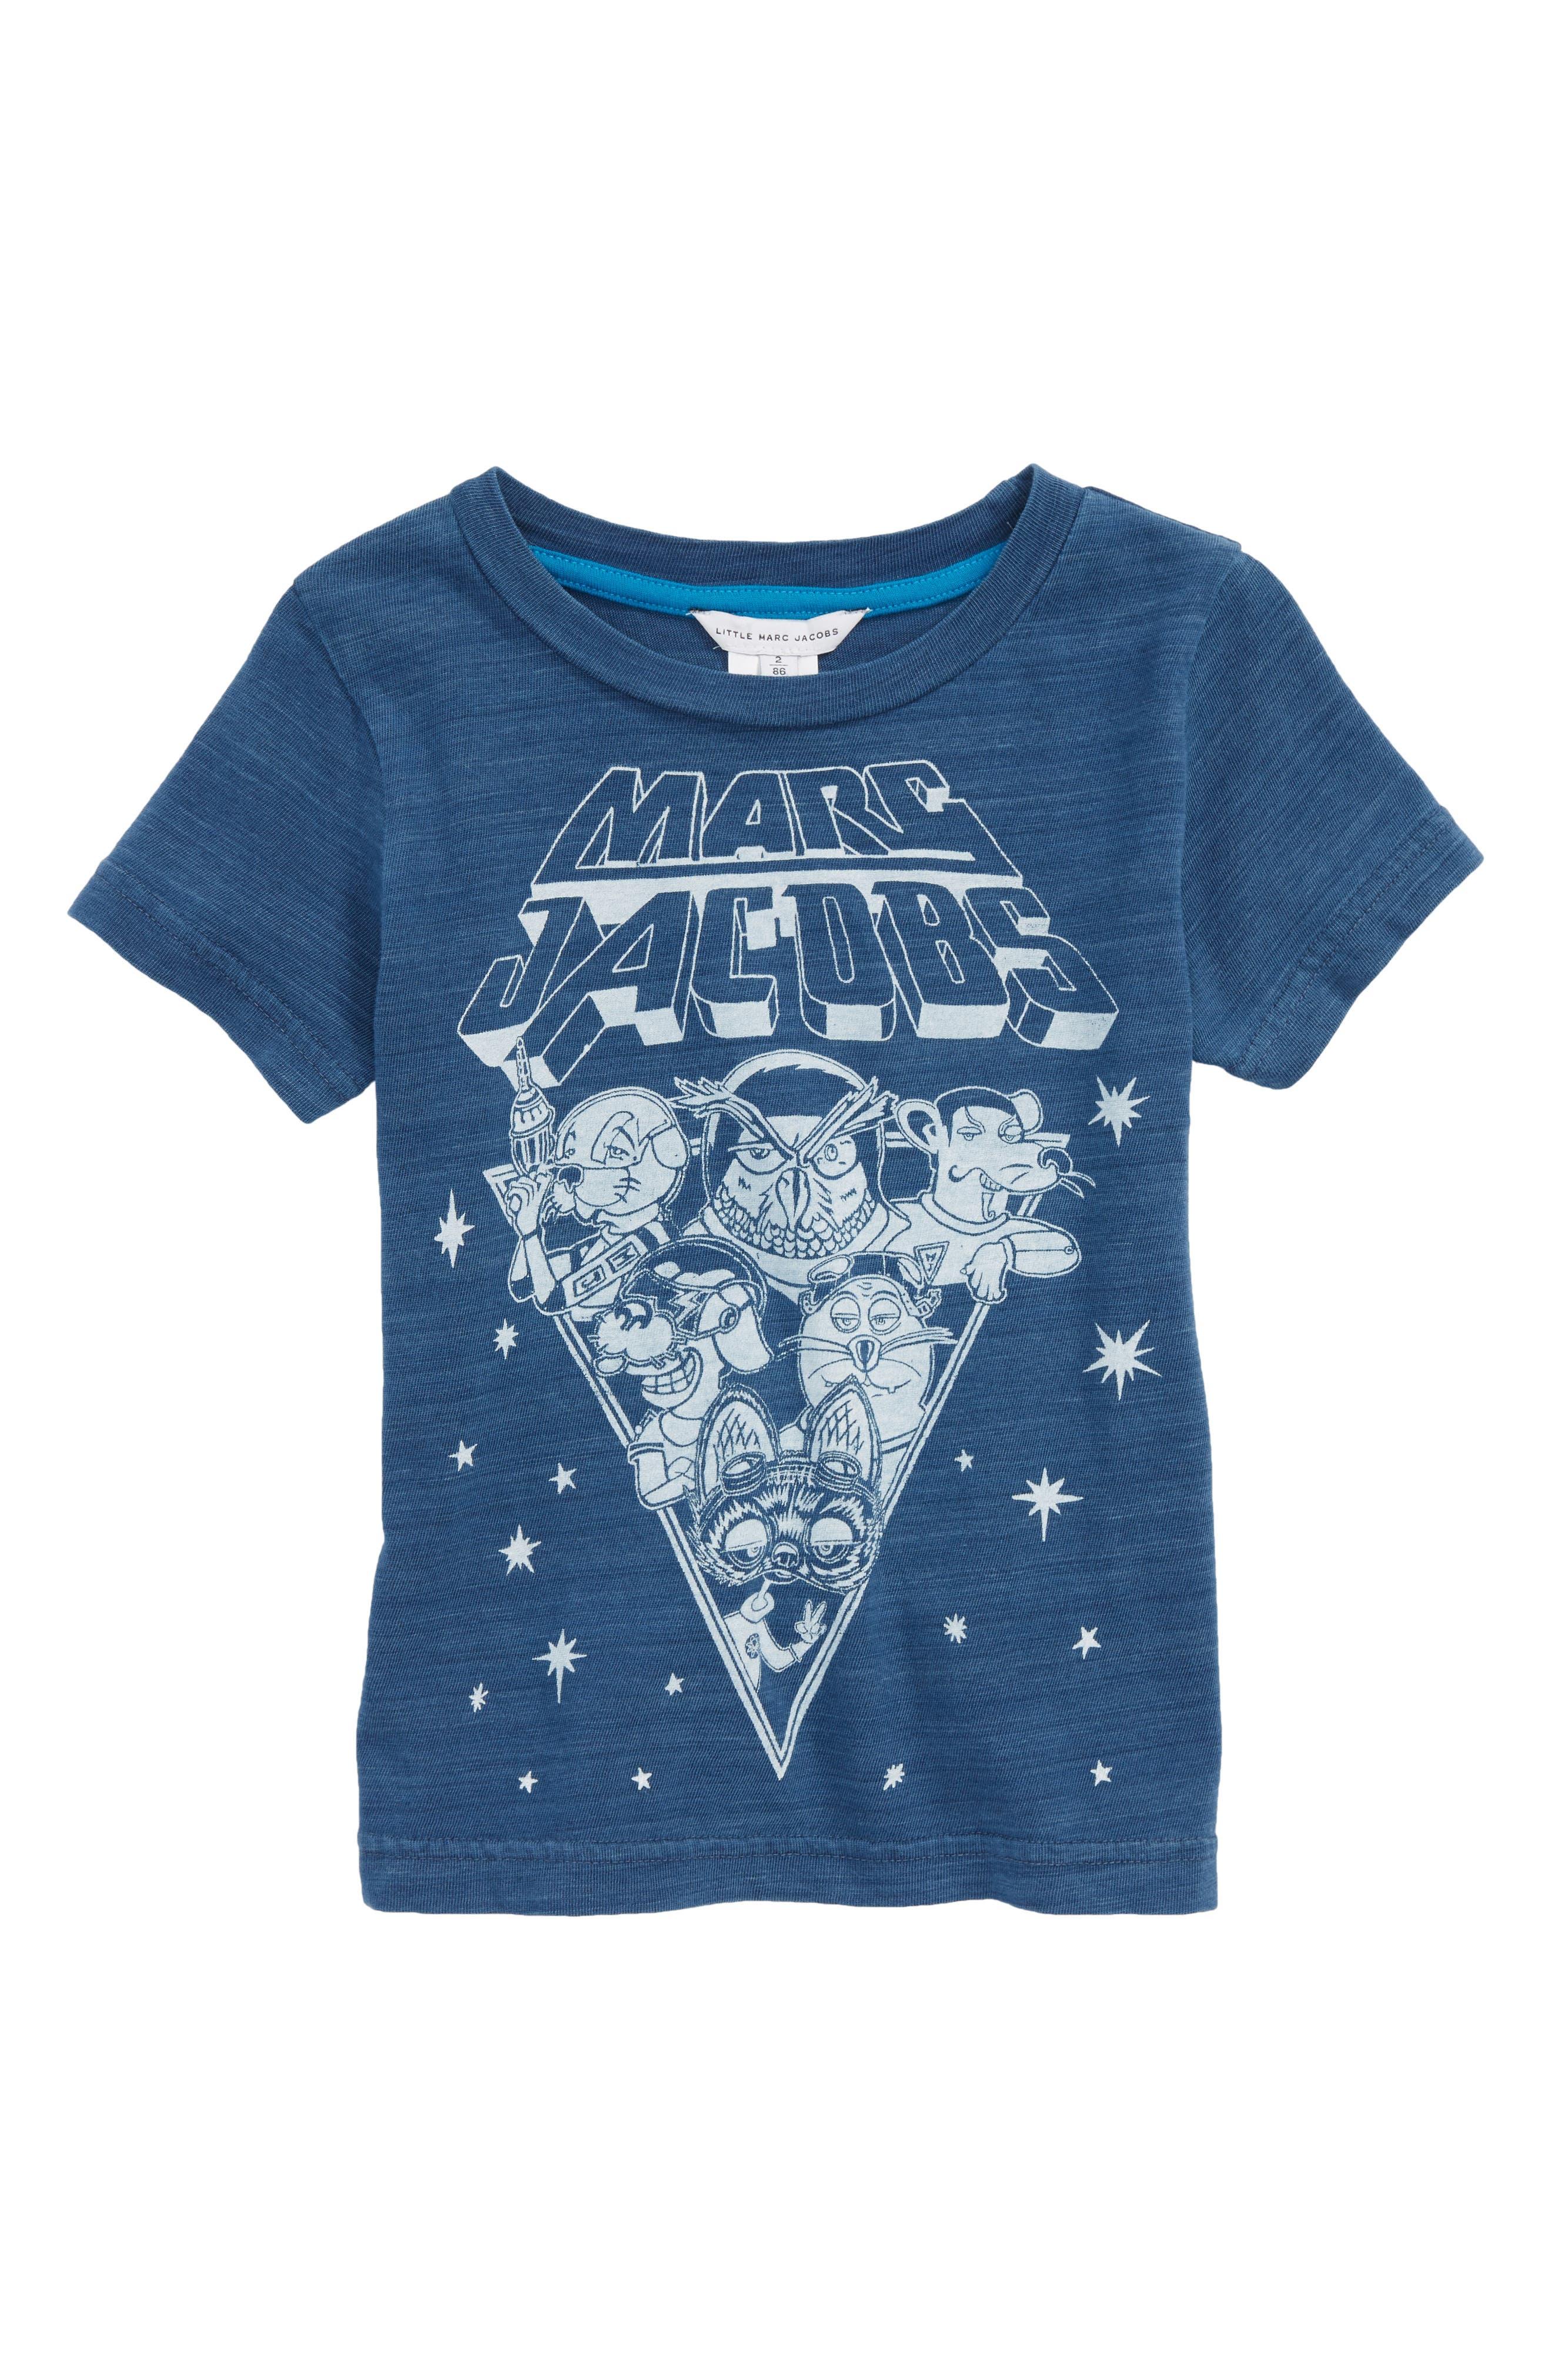 Space T-Shirt,                         Main,                         color, Indigo/ Lavendar